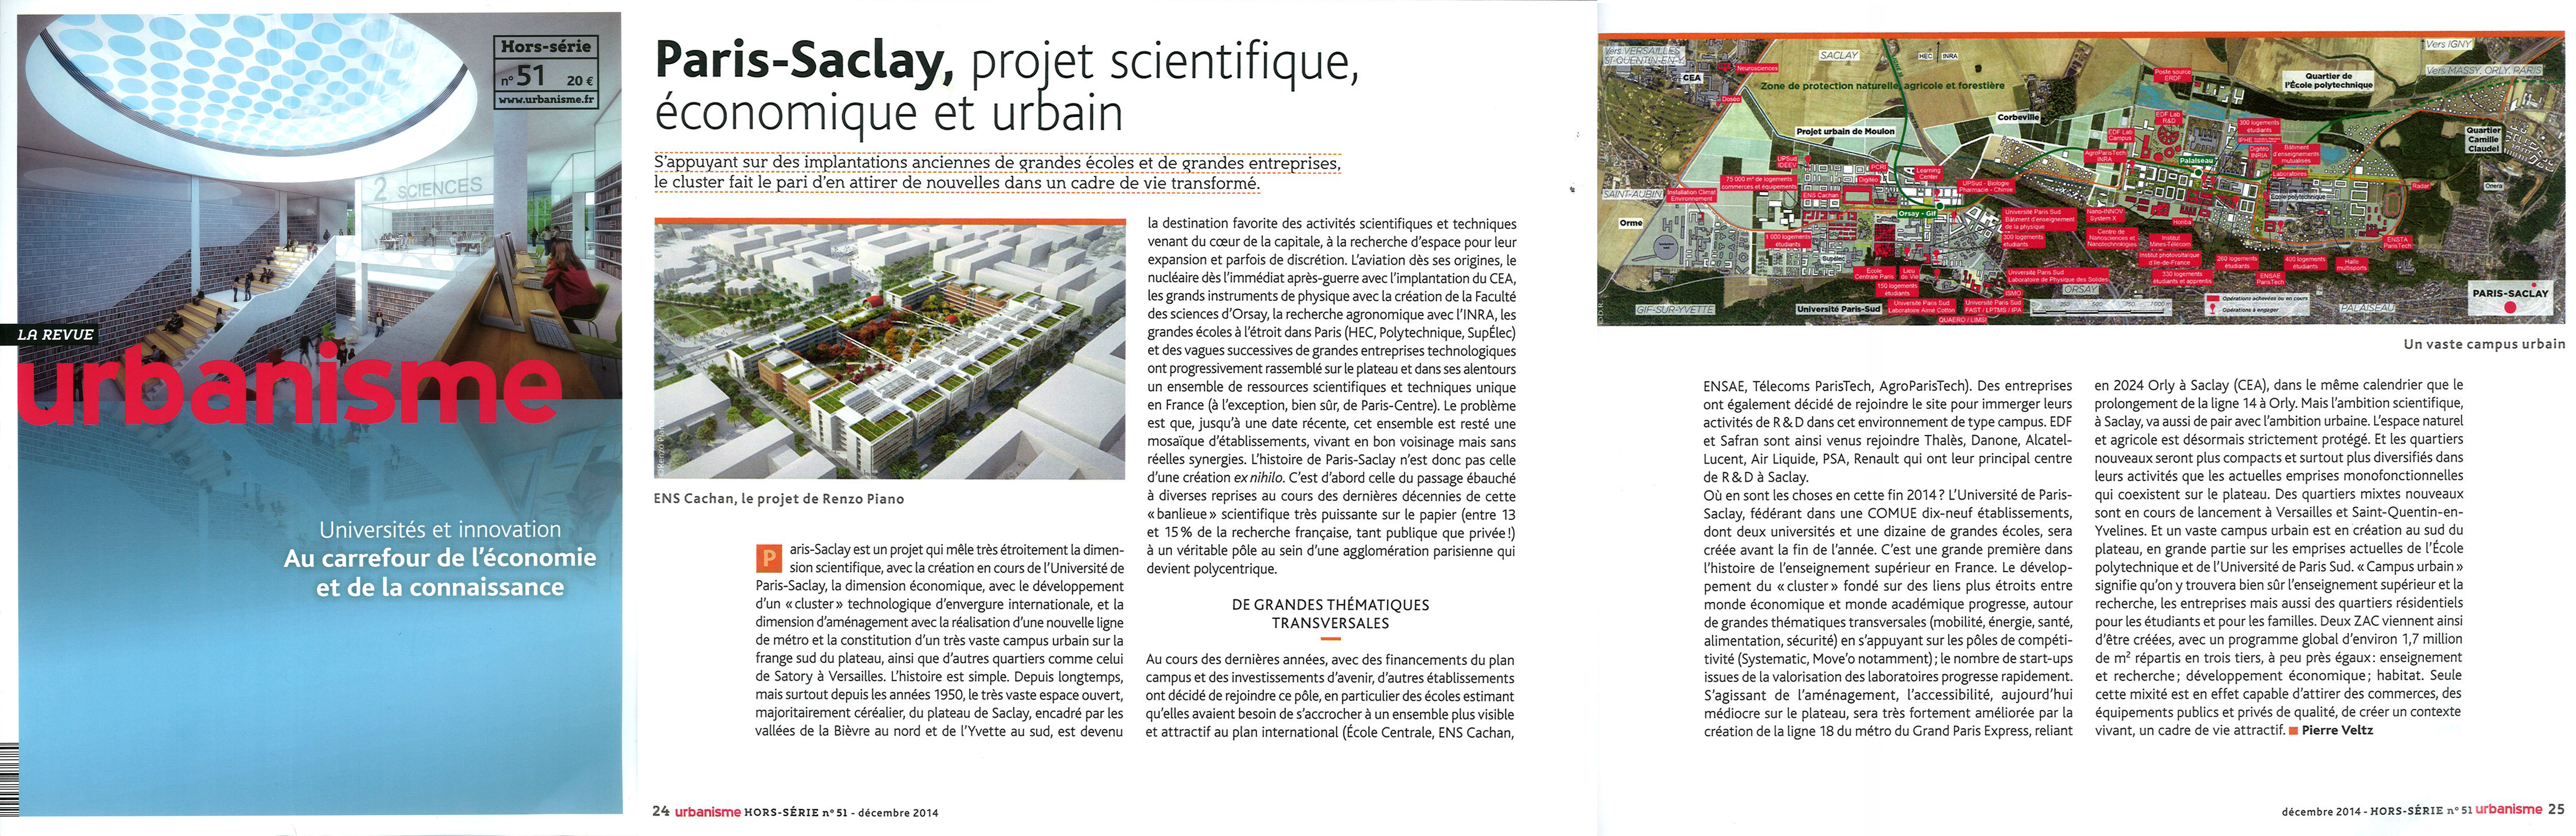 UrbanismeHS51_dec14_ENS_lt